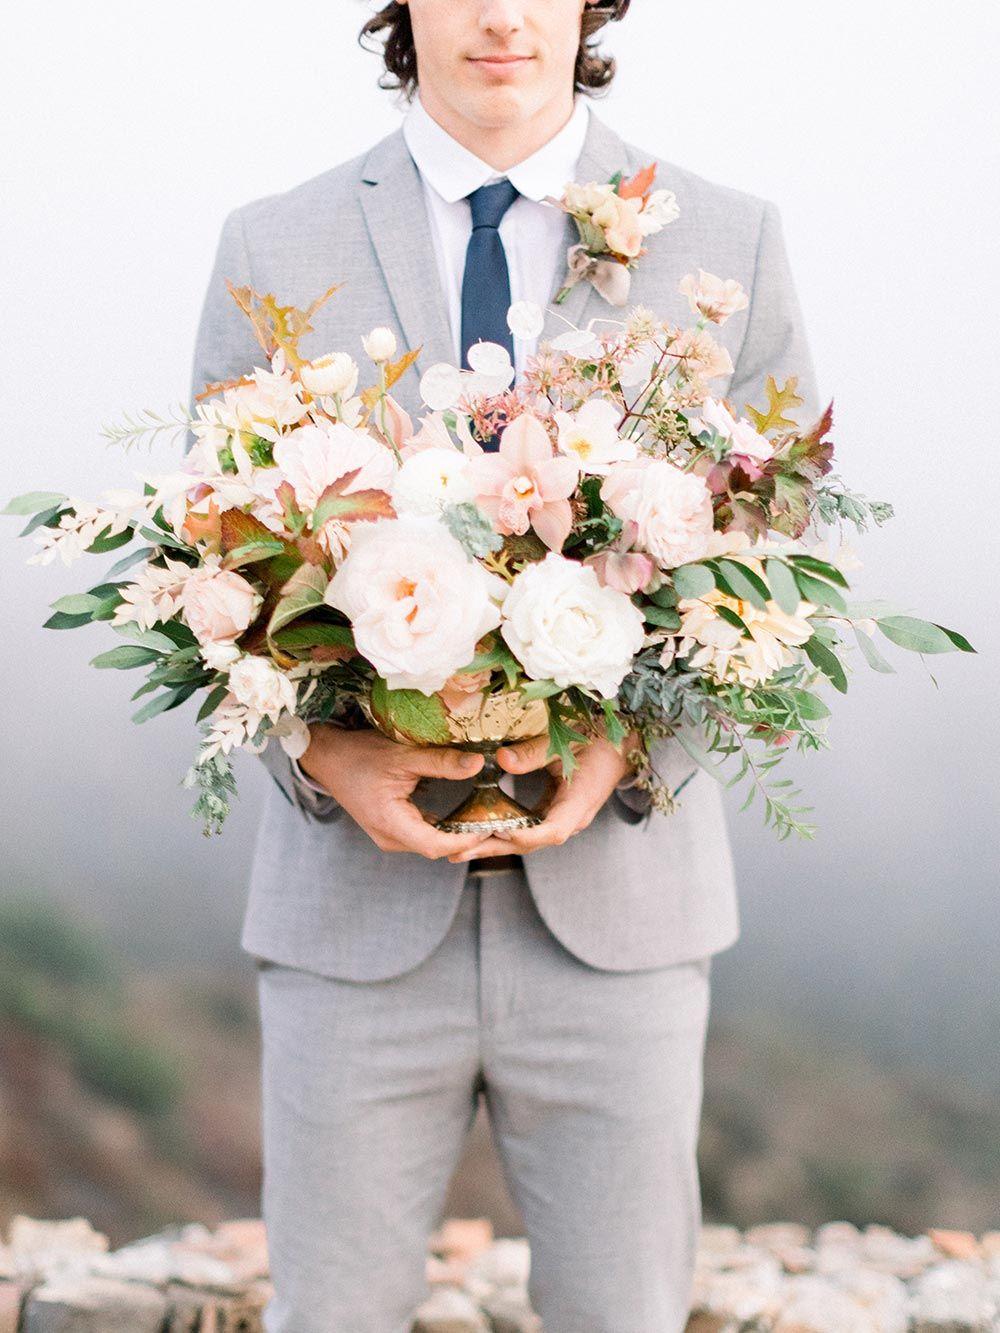 Colorful Sunset Wedding Inspiration with Malibu Mountain Views